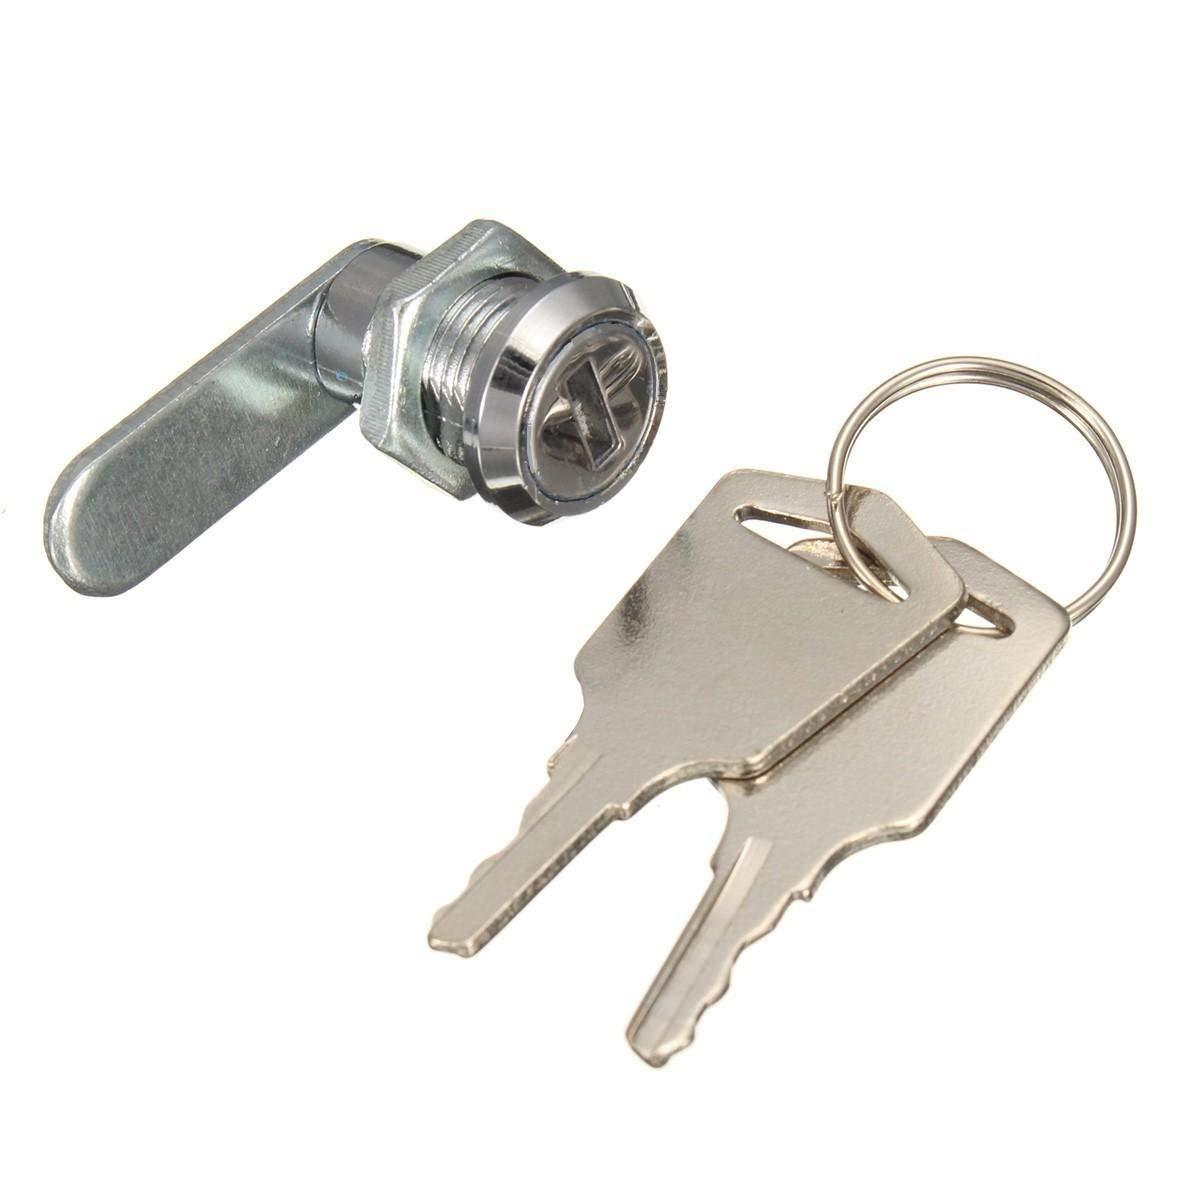 16mm Keyed Cam Lock For Filing Cabinet Mailbox Drawer Cupboard with 2 Keys - Hardware & Accessories Door Hardware & Locks - 1 x Cam lock 2 x Keys